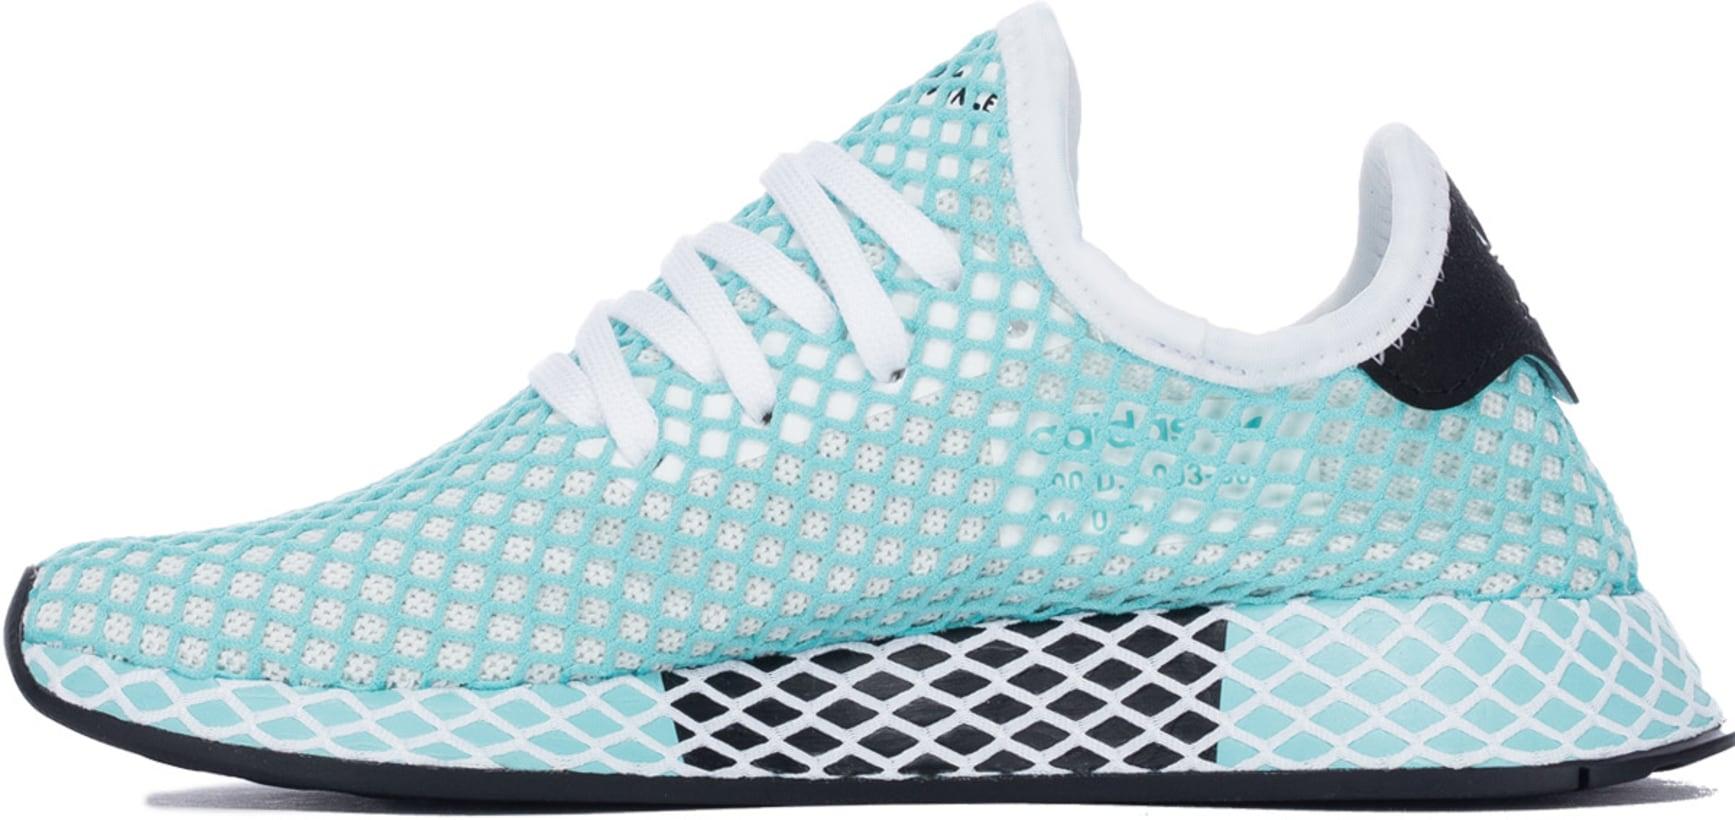 finest selection d3ff5 87b77 adidas Originals Deerupt Runner Parley - Footwear WhiteFootwear  WhiteBlue Spirit  Influence U